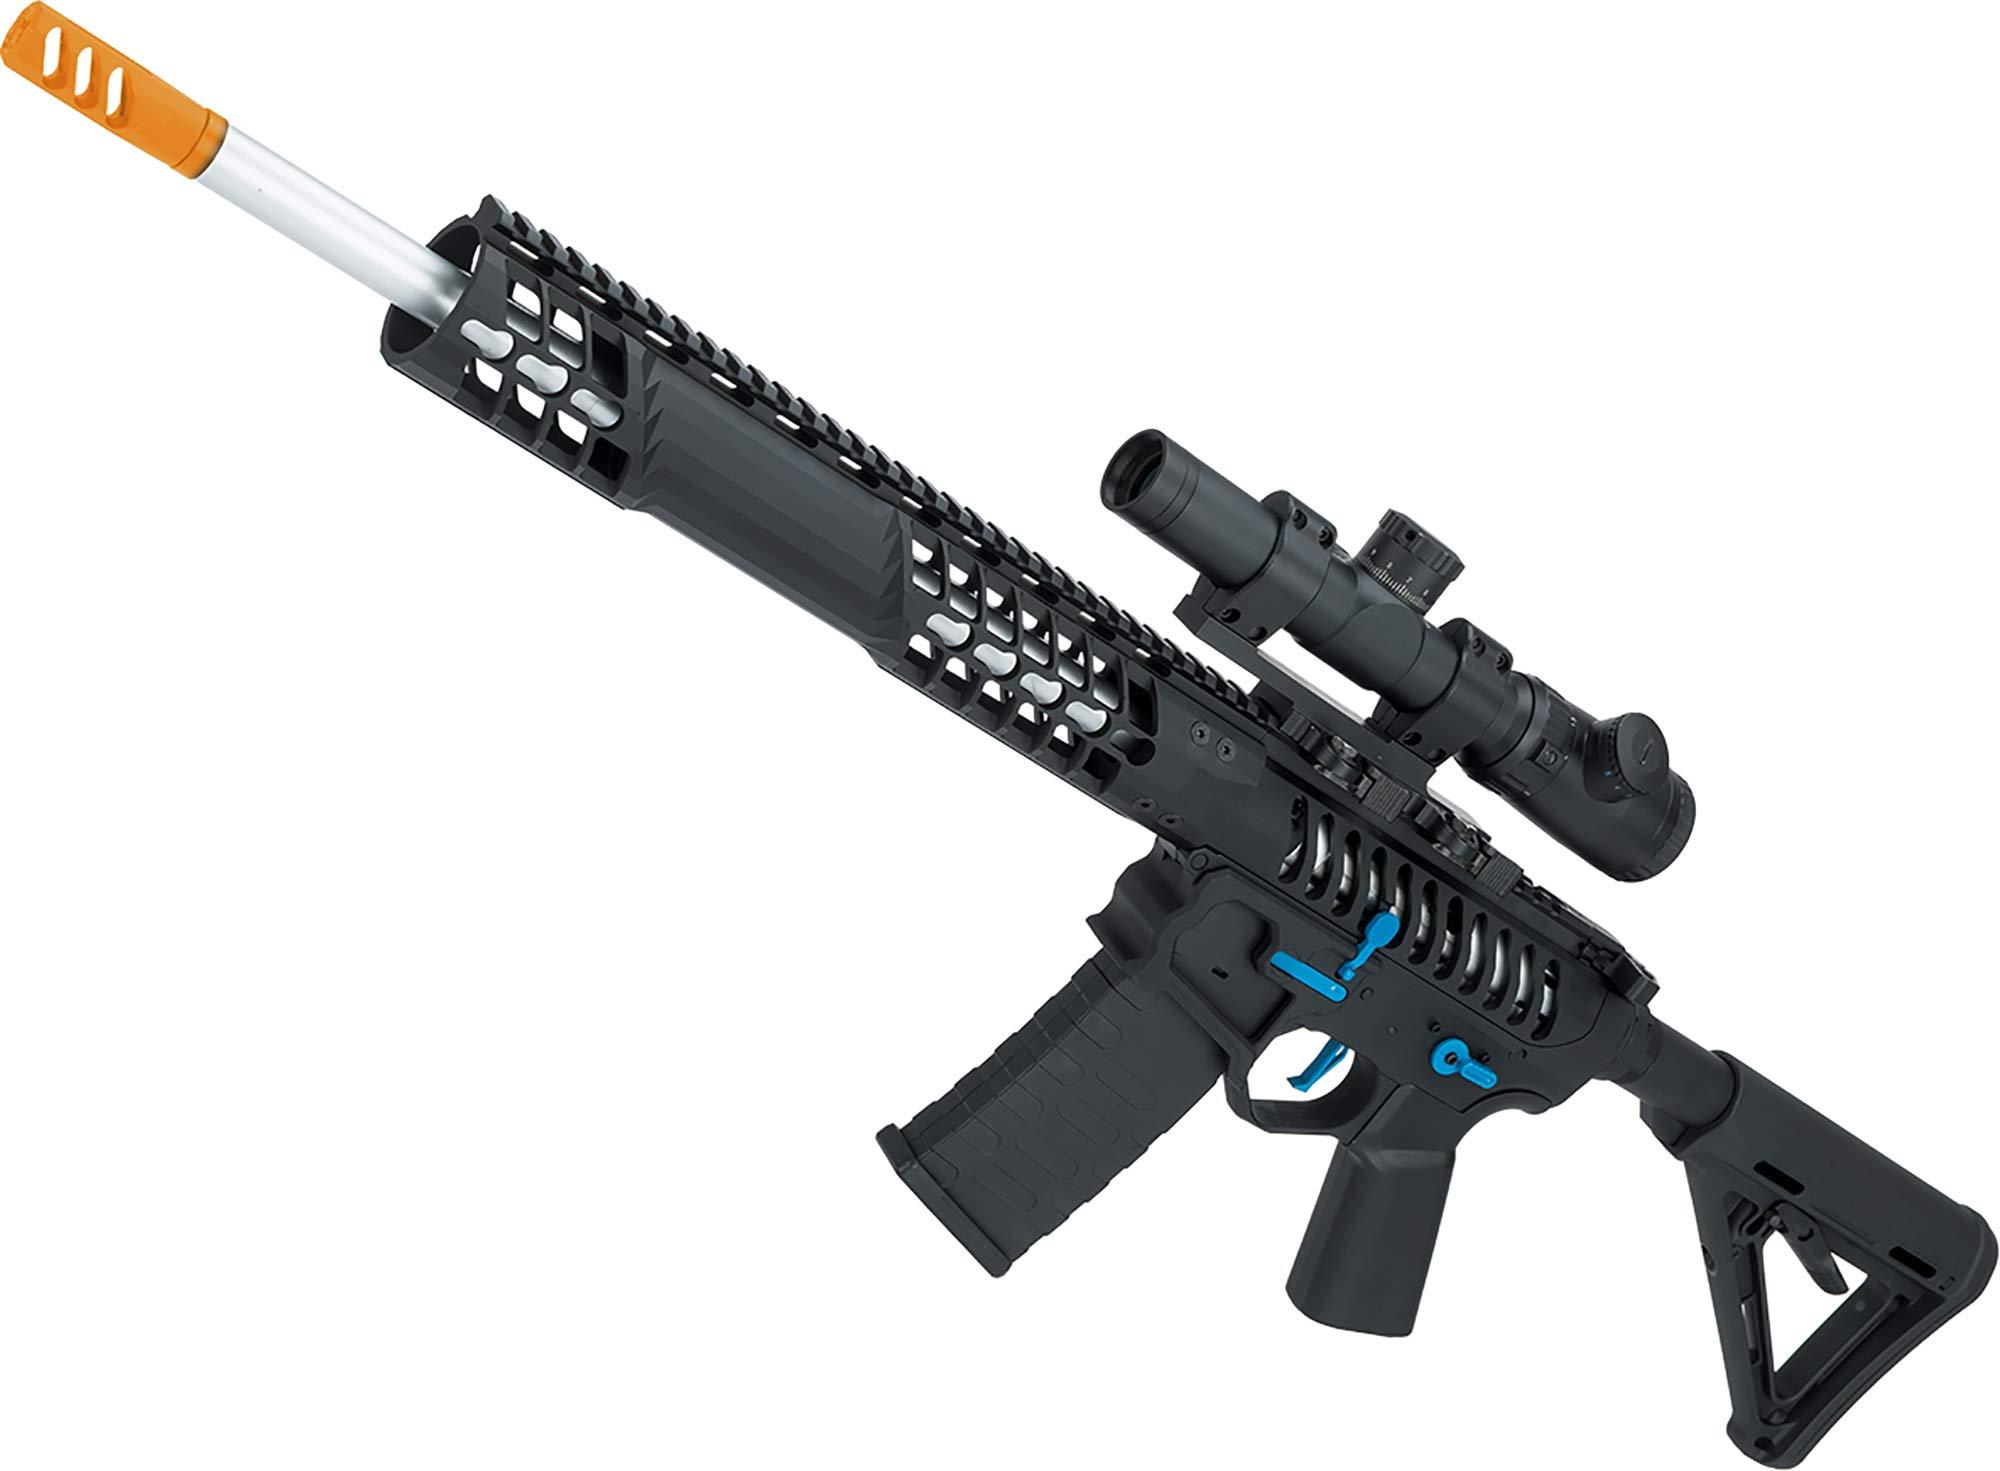 Evike EMG F1 Firearms BDR-15 3G AR15 Full Metal Airsoft AEG Rifle (Color: Black/Blue Selector/Magpul MOE Stock) by Evike